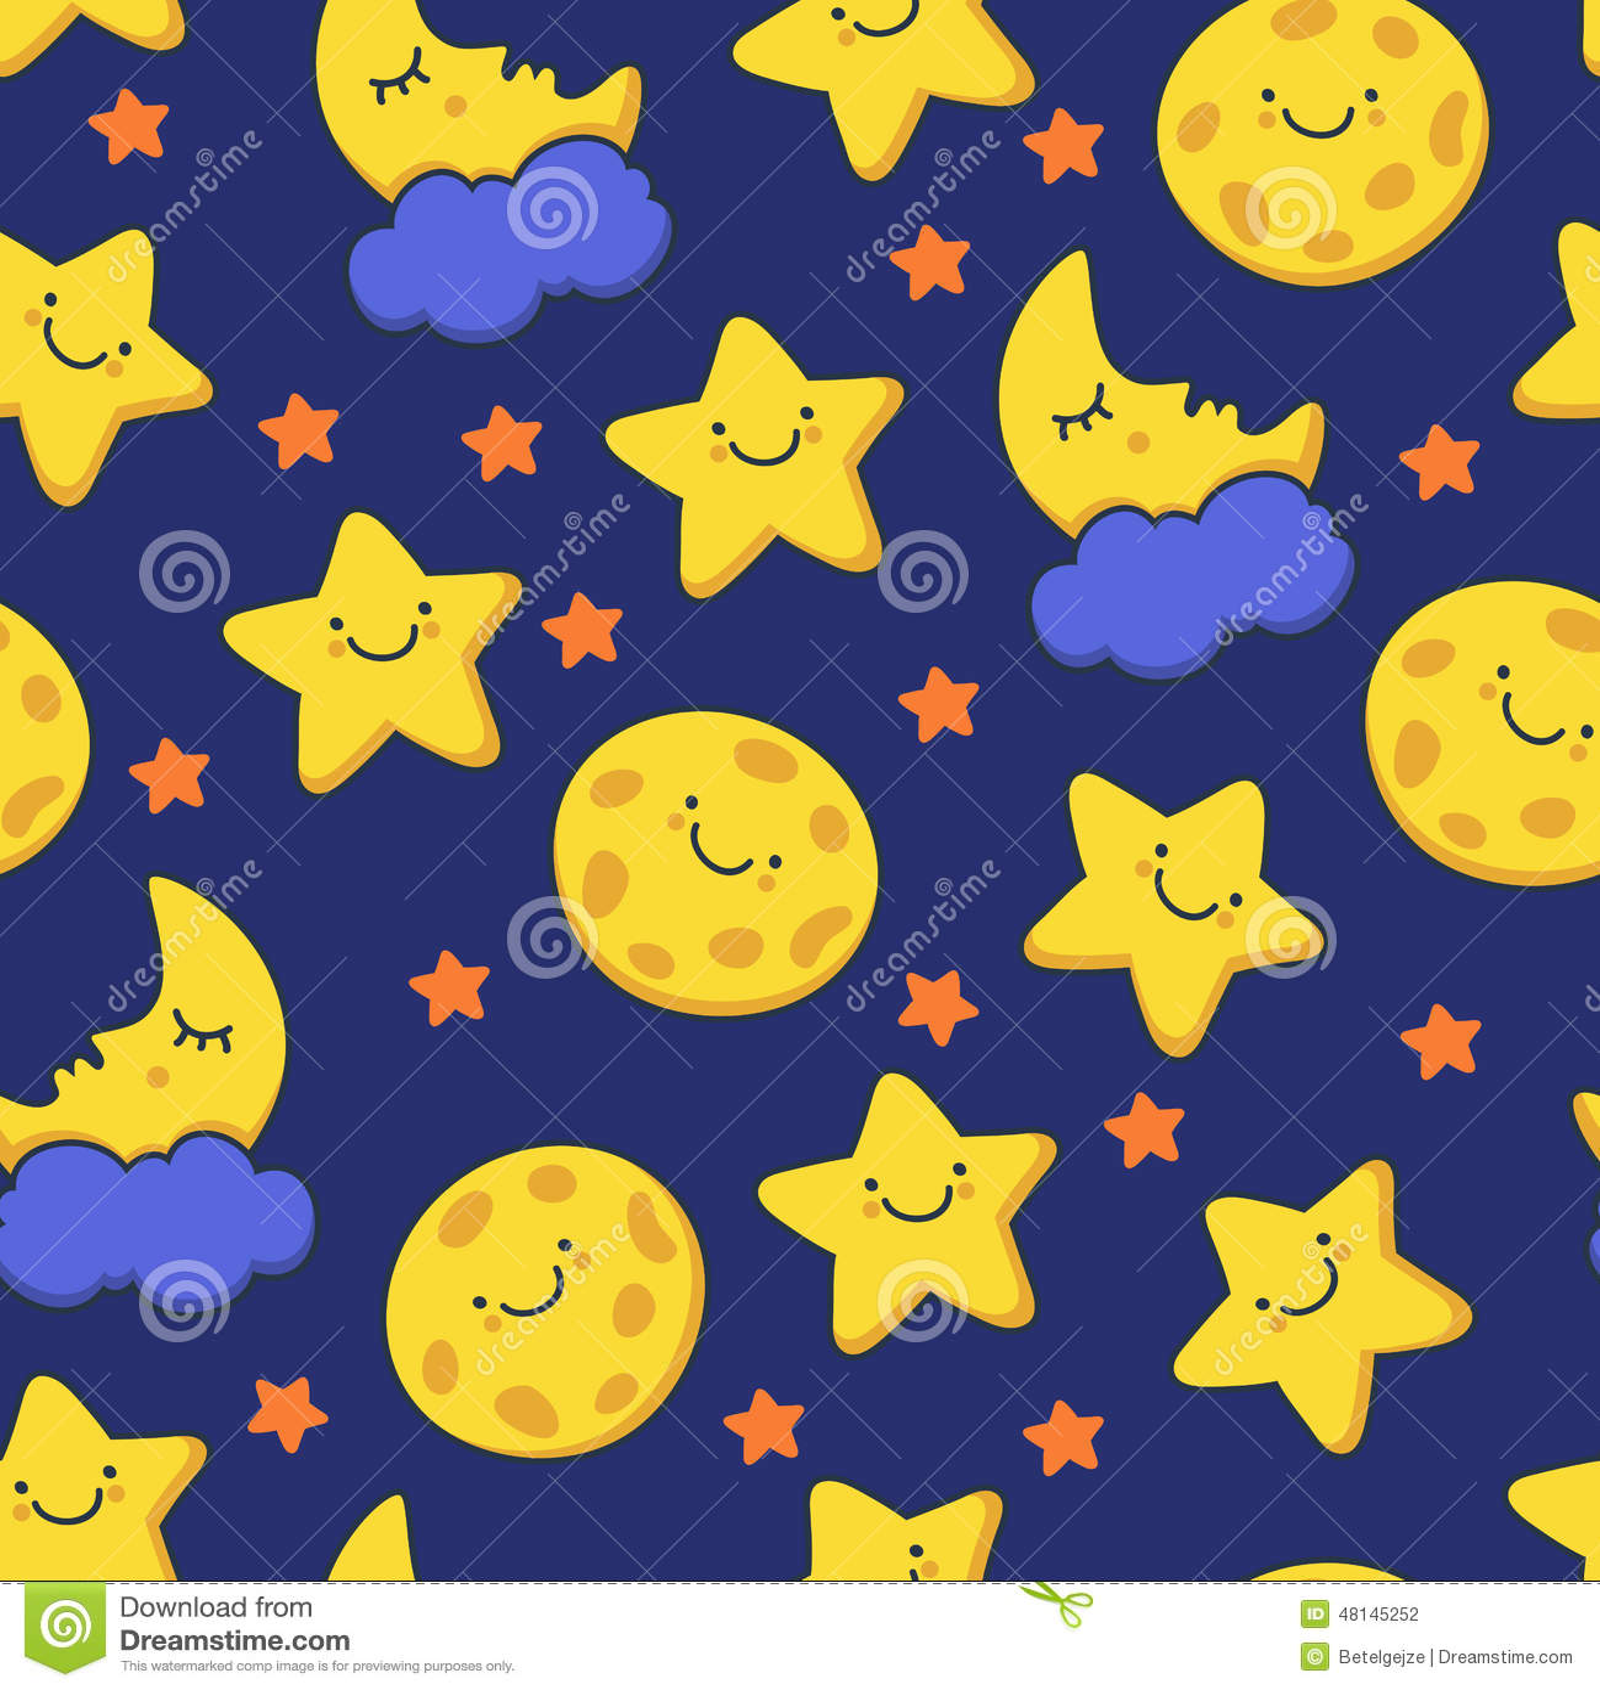 cartoon night vector wallpaper - photo #41